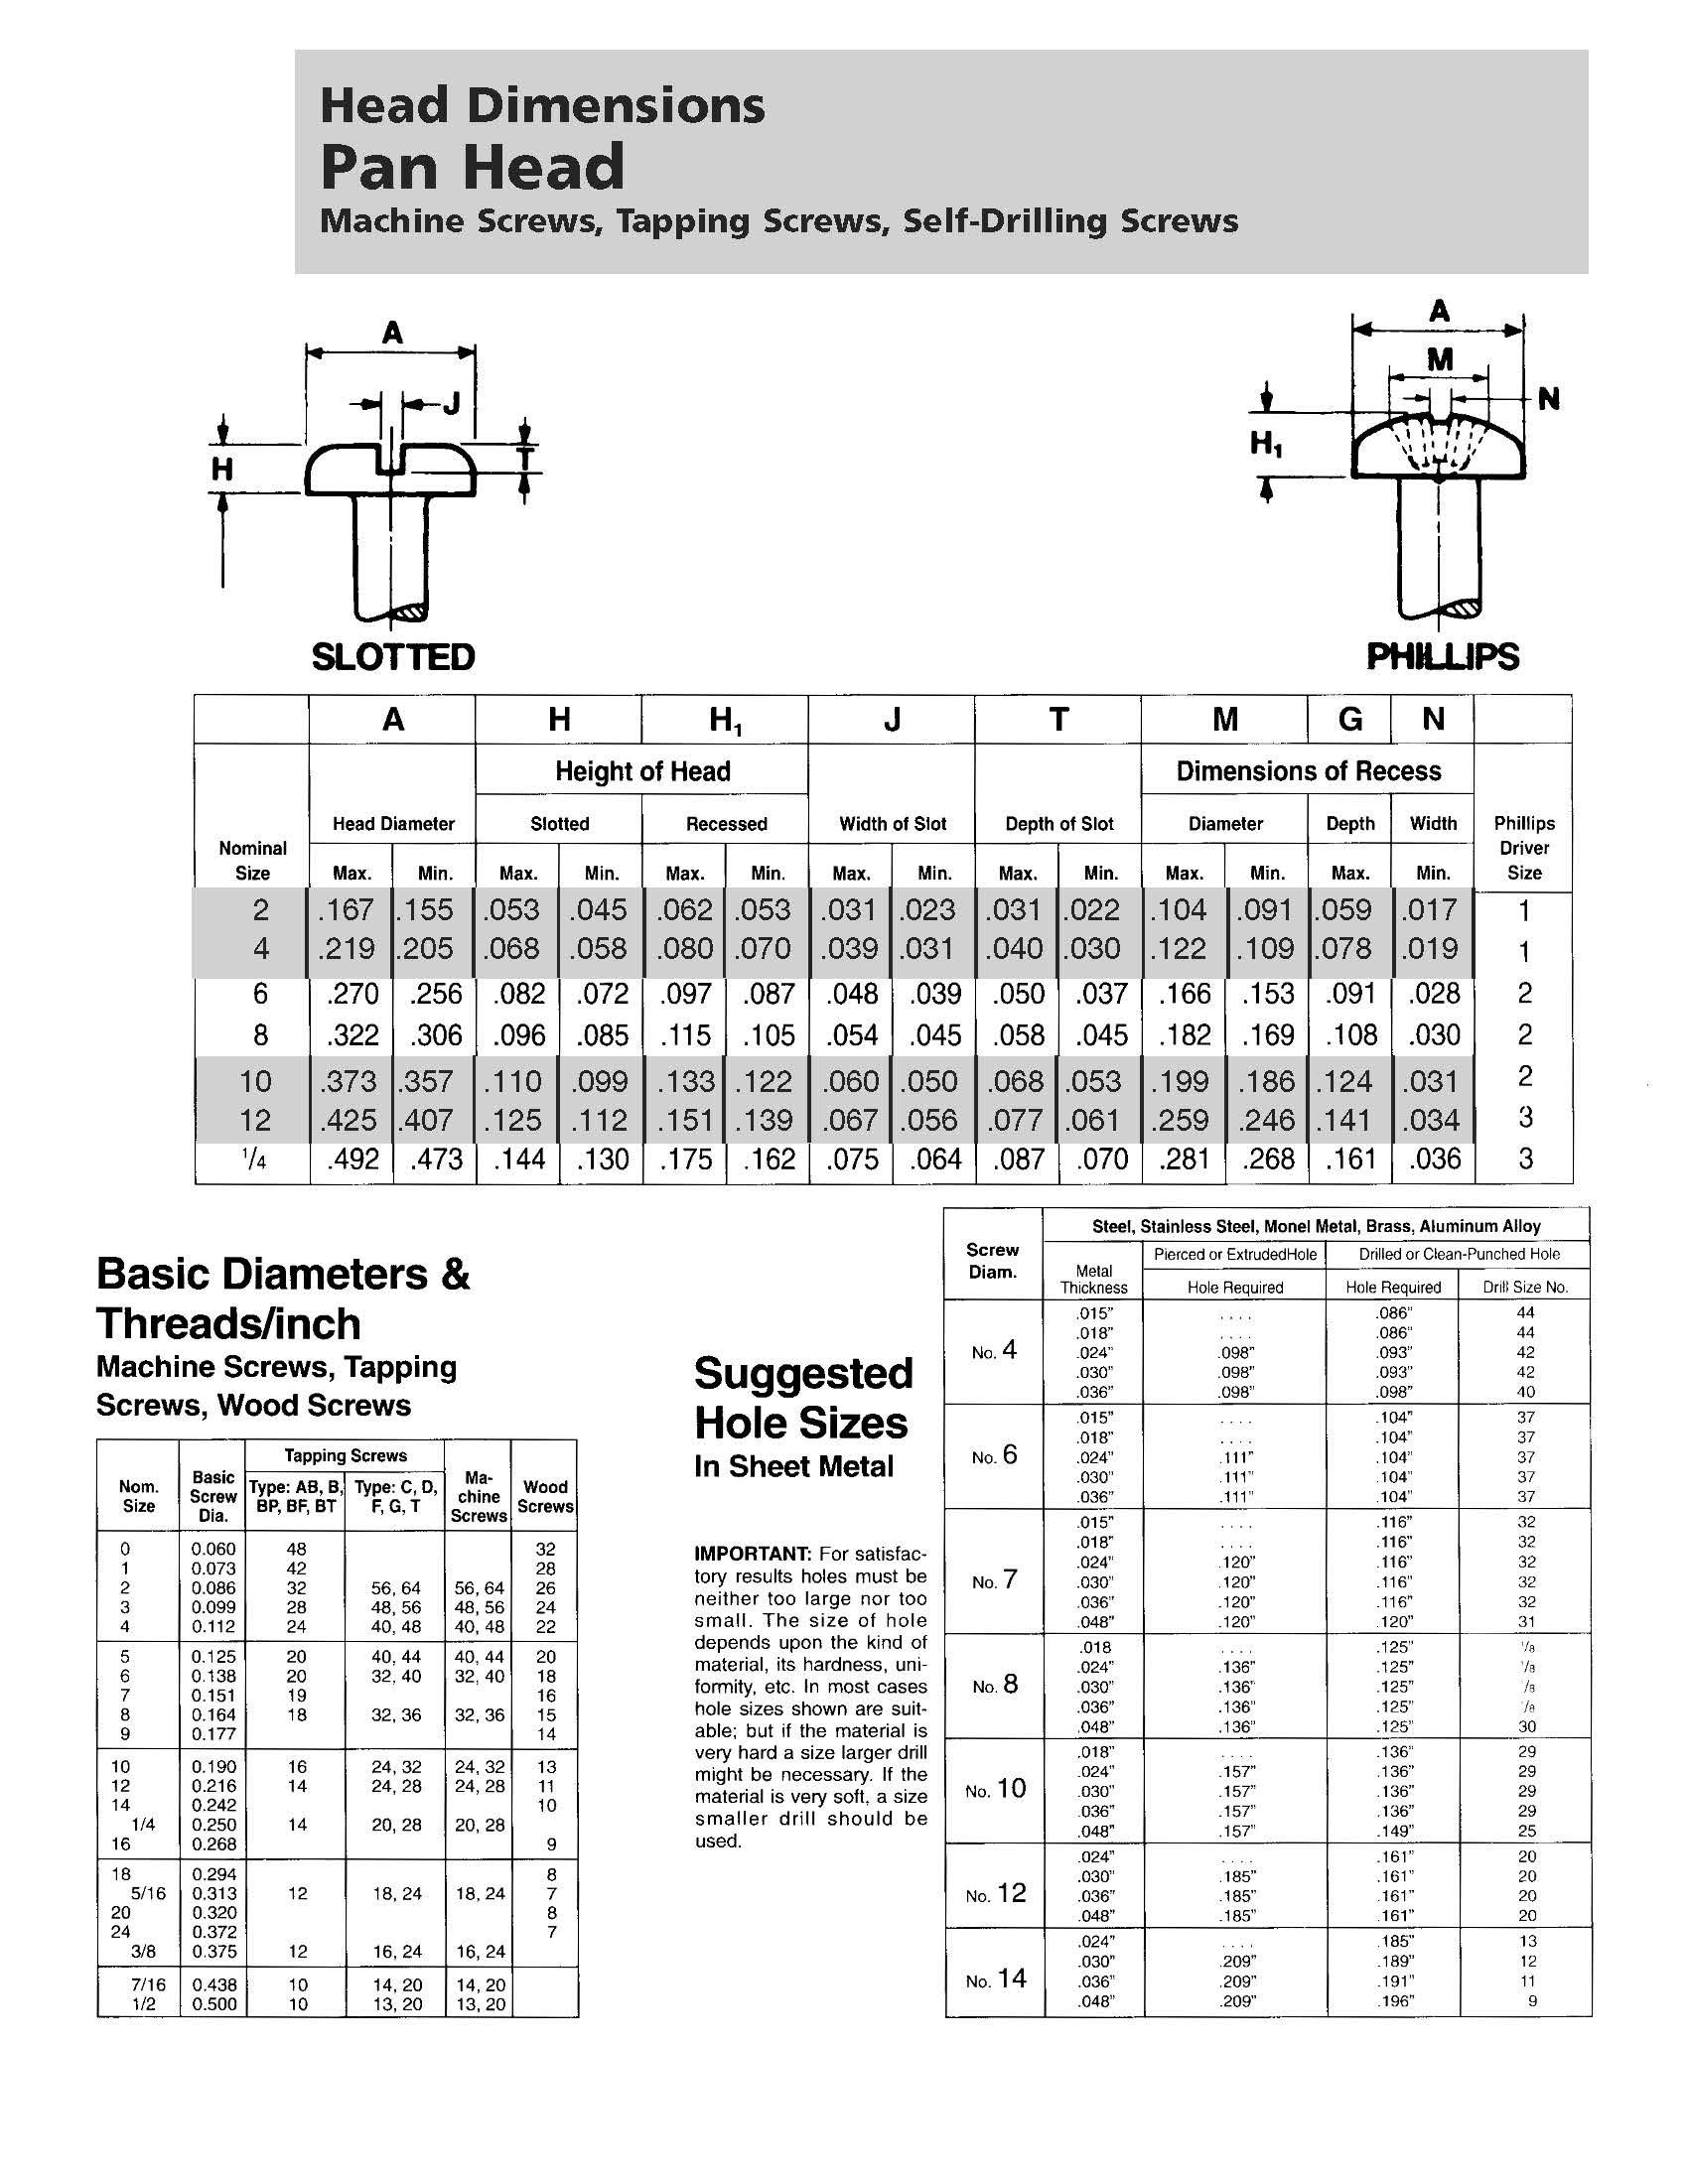 Pan head dimensions